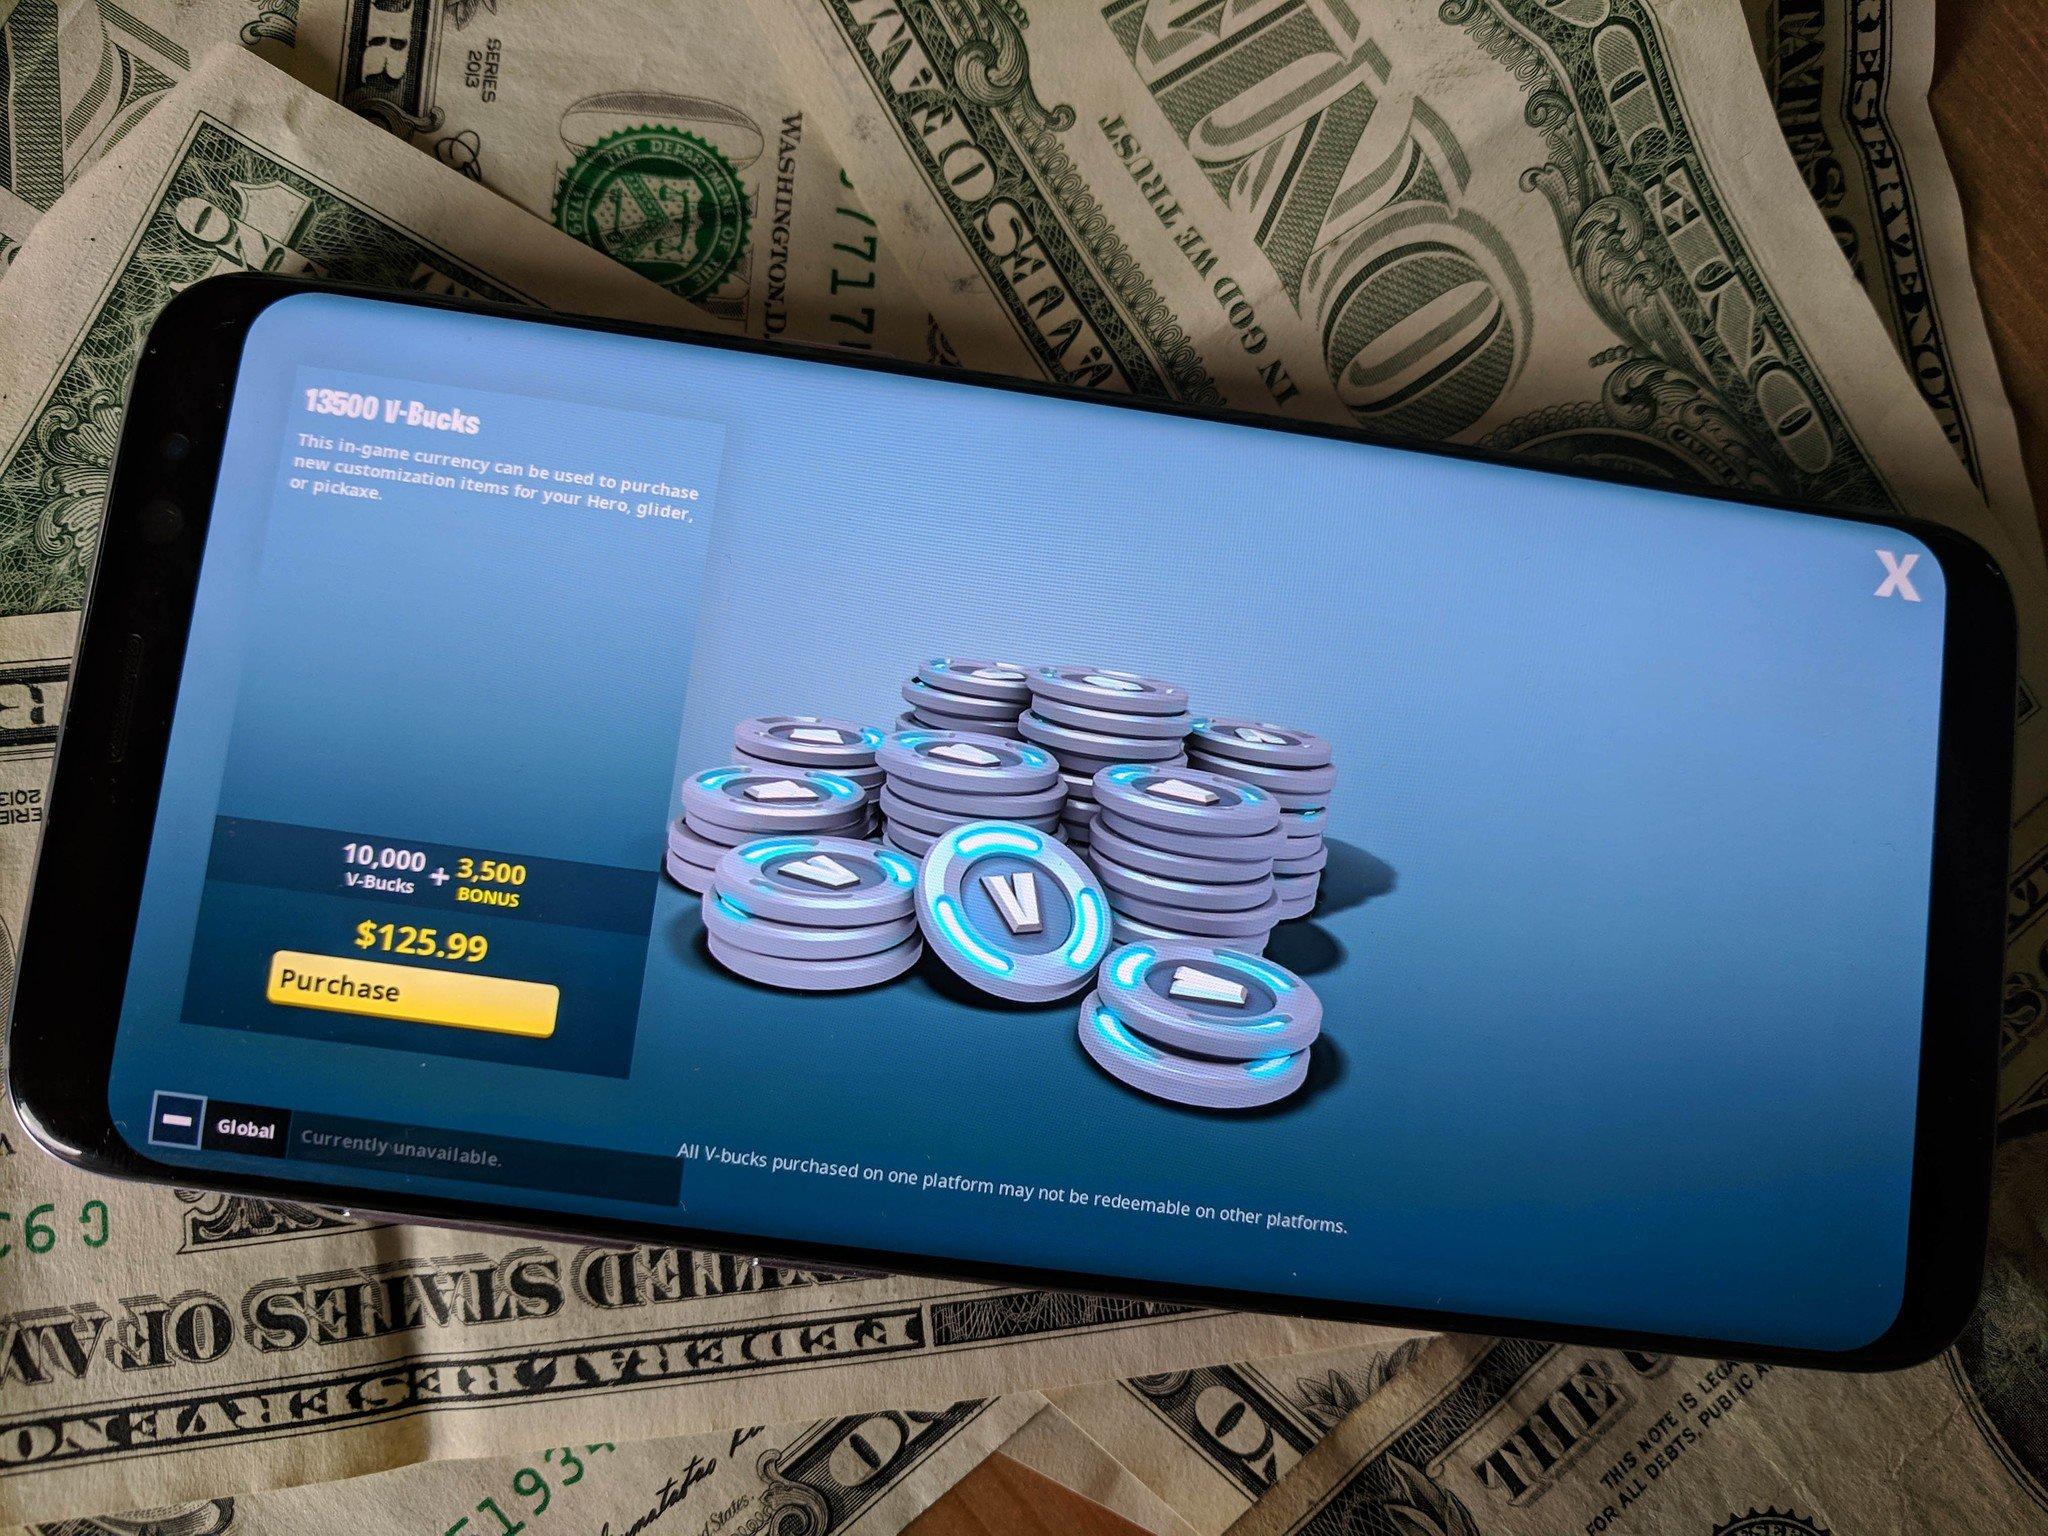 Steam Community Get Free Fortnite V Bucks Hack Cheats Tool 2018